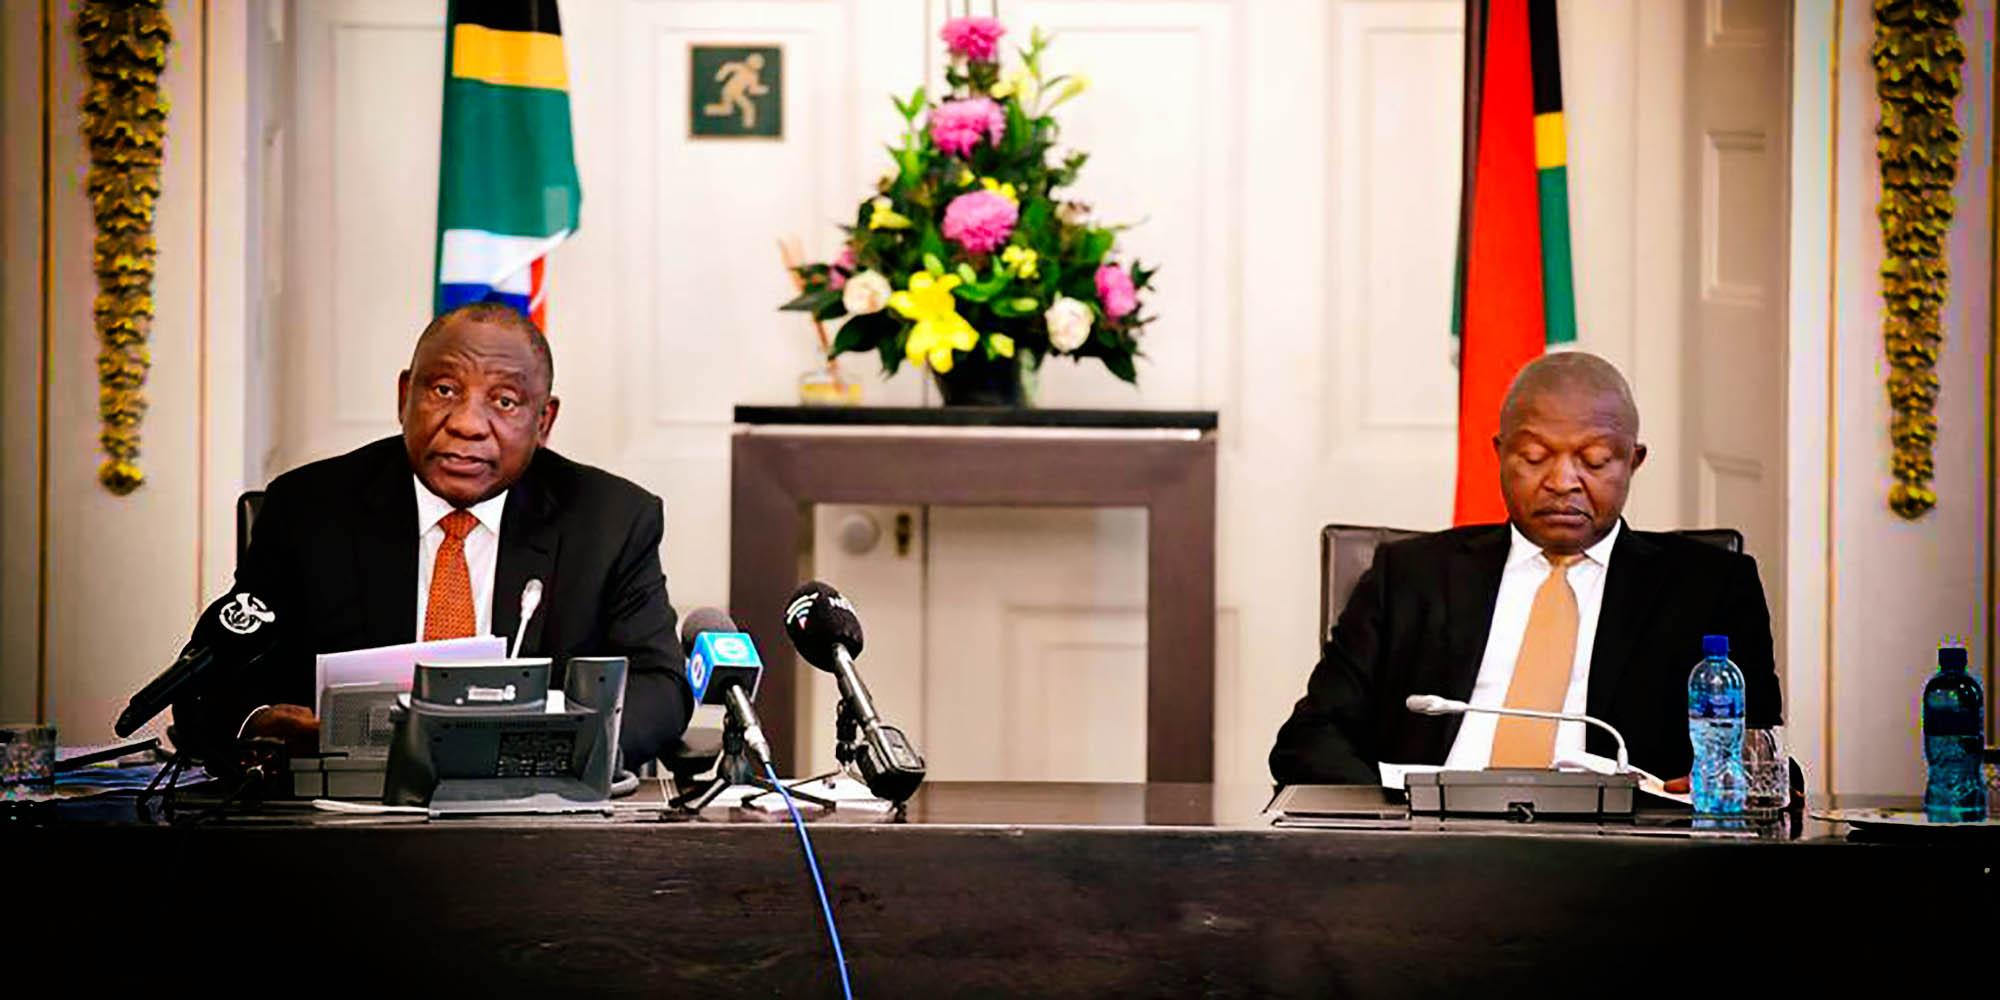 BUSINESS MAVERICK: SA's WEF ranking advances while business confidence rises